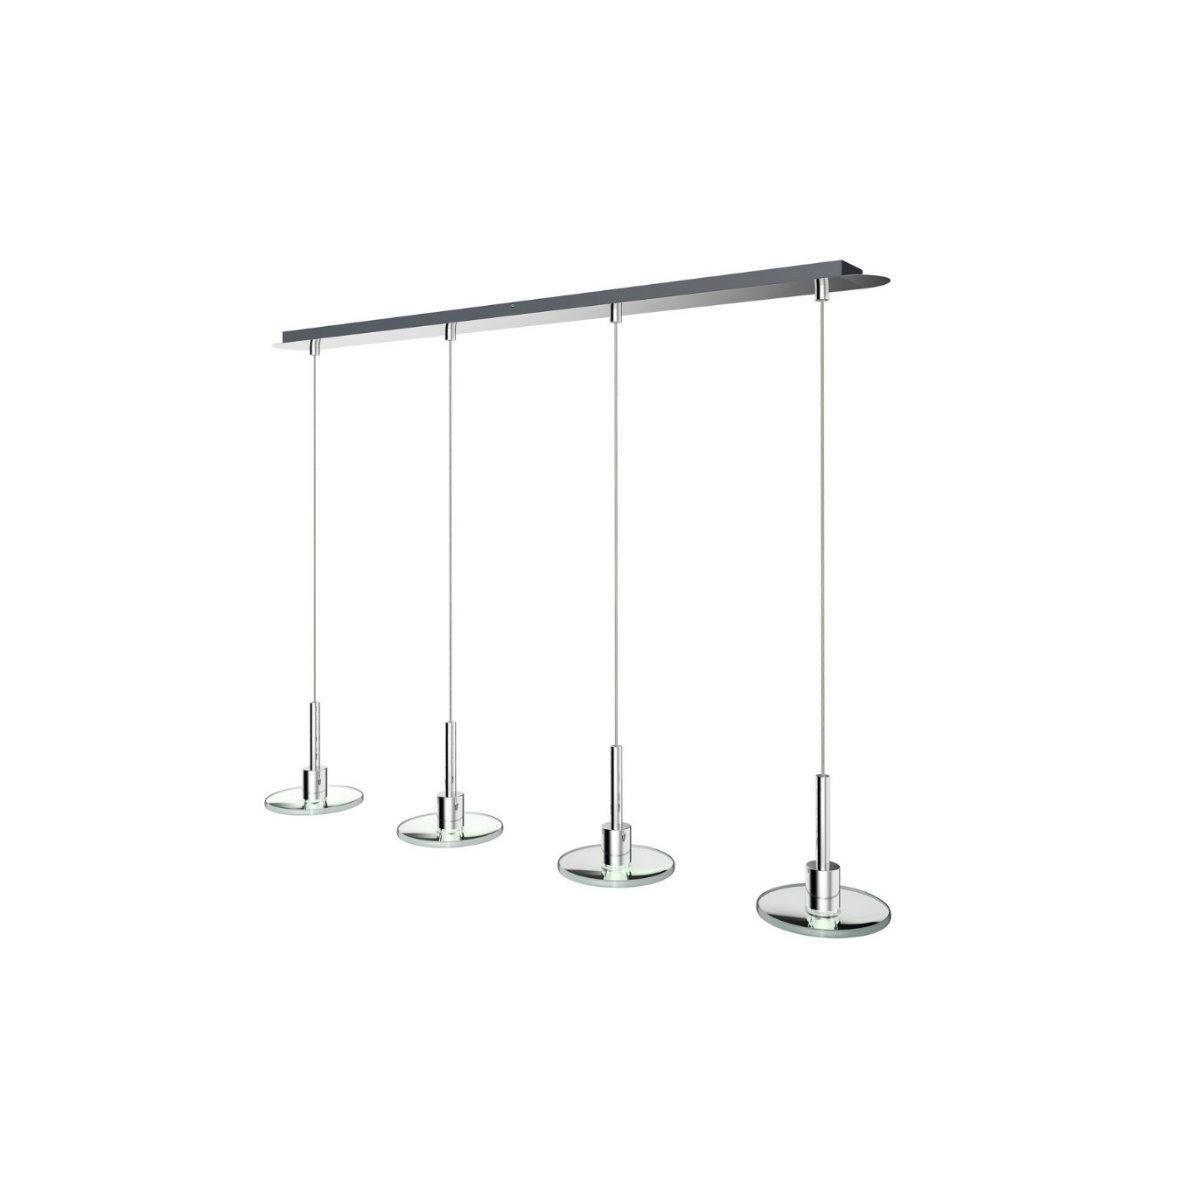 LED-Pendelleuchte-Leuchte-COB-SMD-Deckenleuchte-Lampe-Haengeleuchte-Beleuchtung